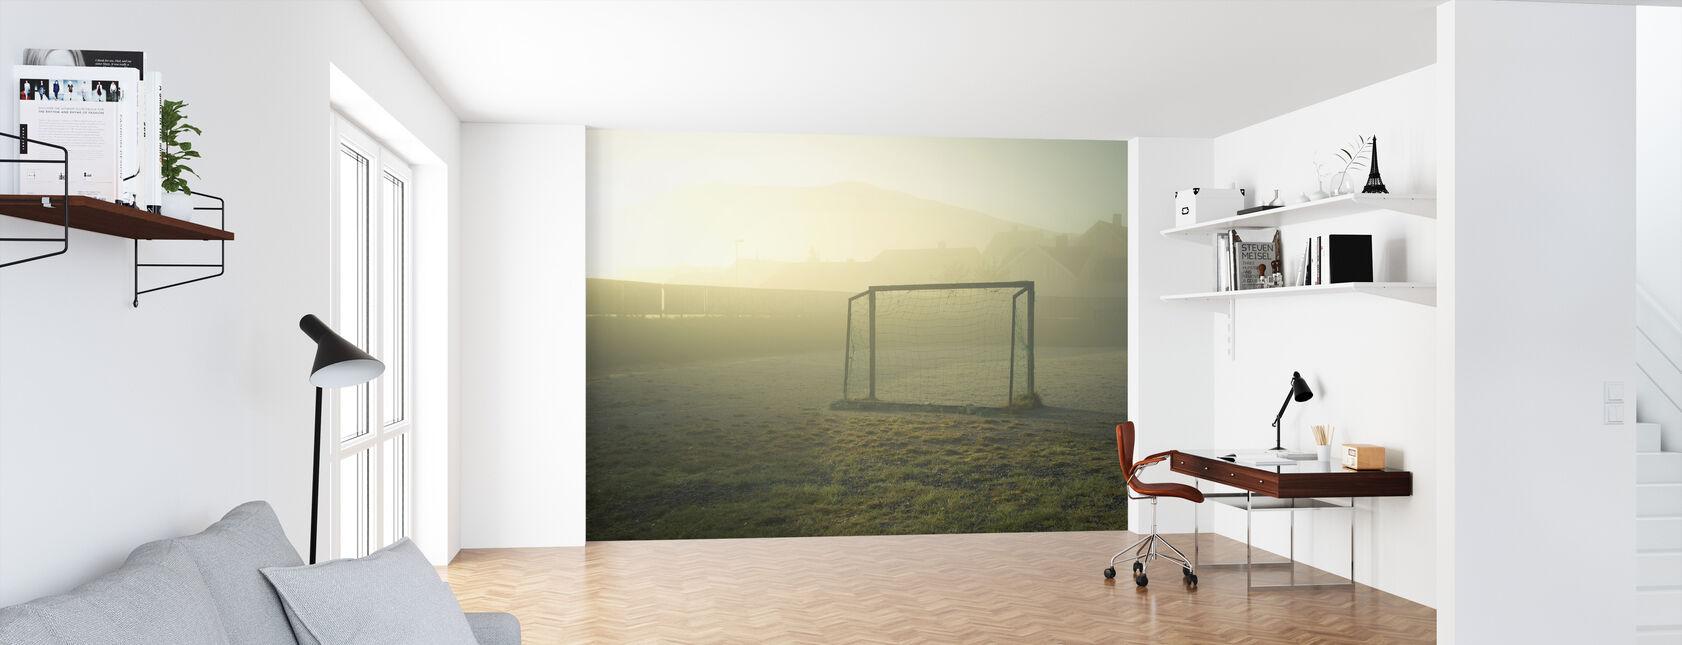 Soccer Field in Sunlight - Wallpaper - Office